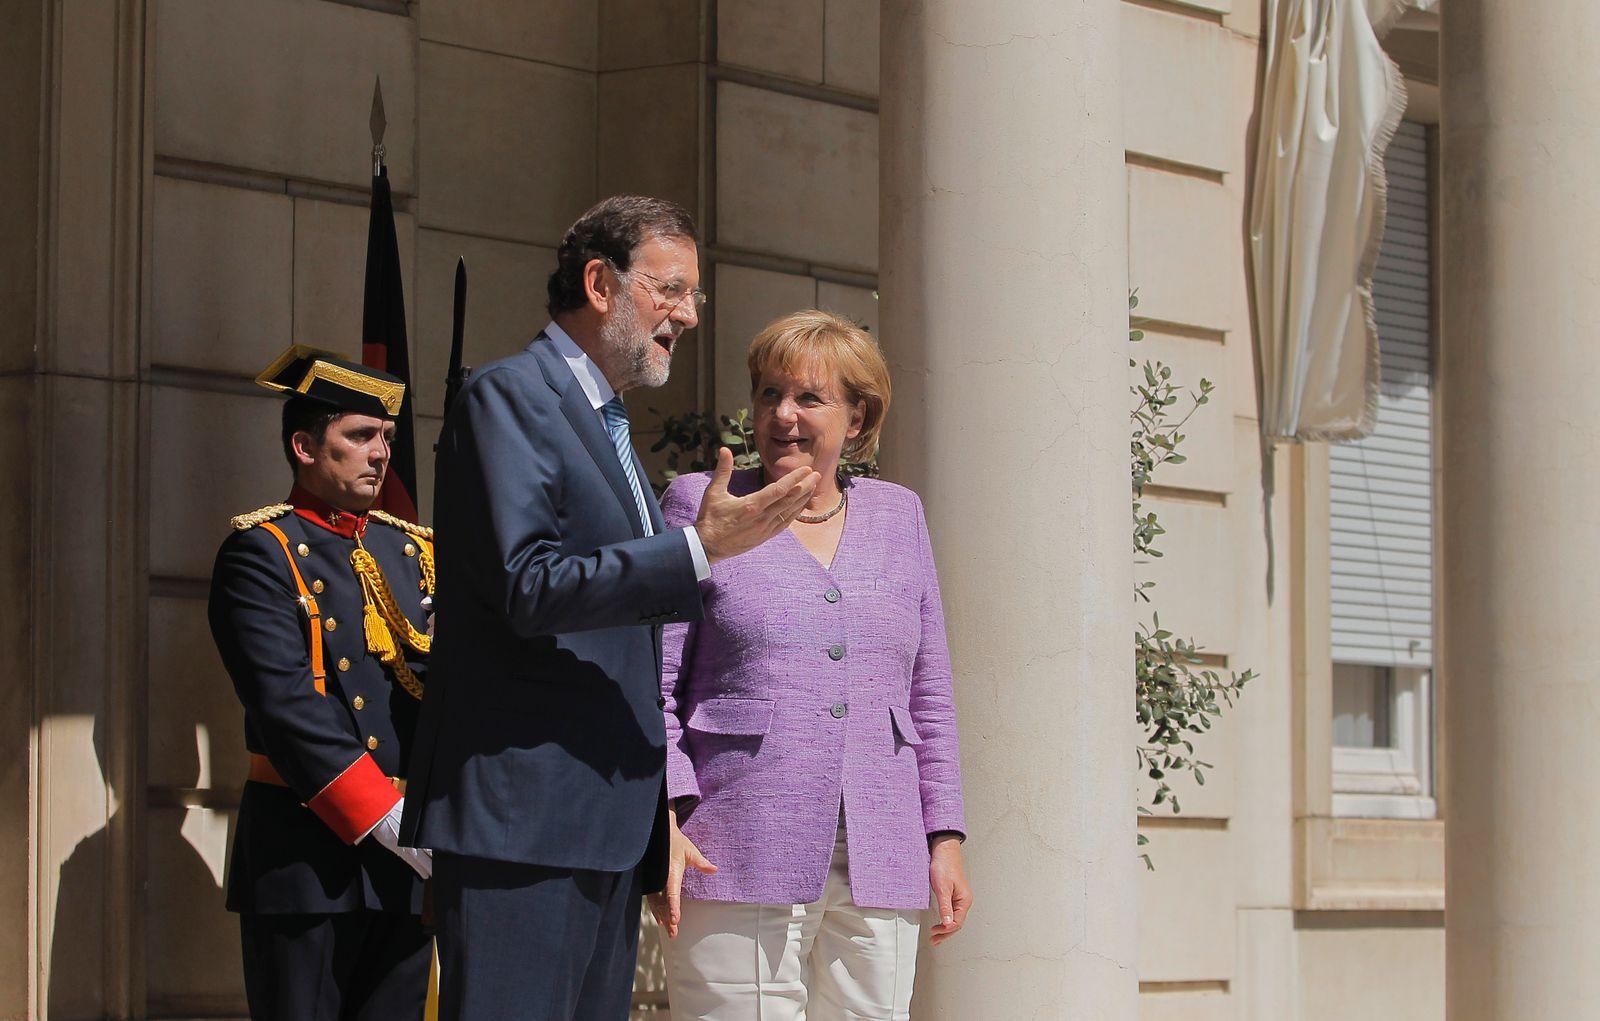 Angela Merkel / Mariano Rajoy / Madrid